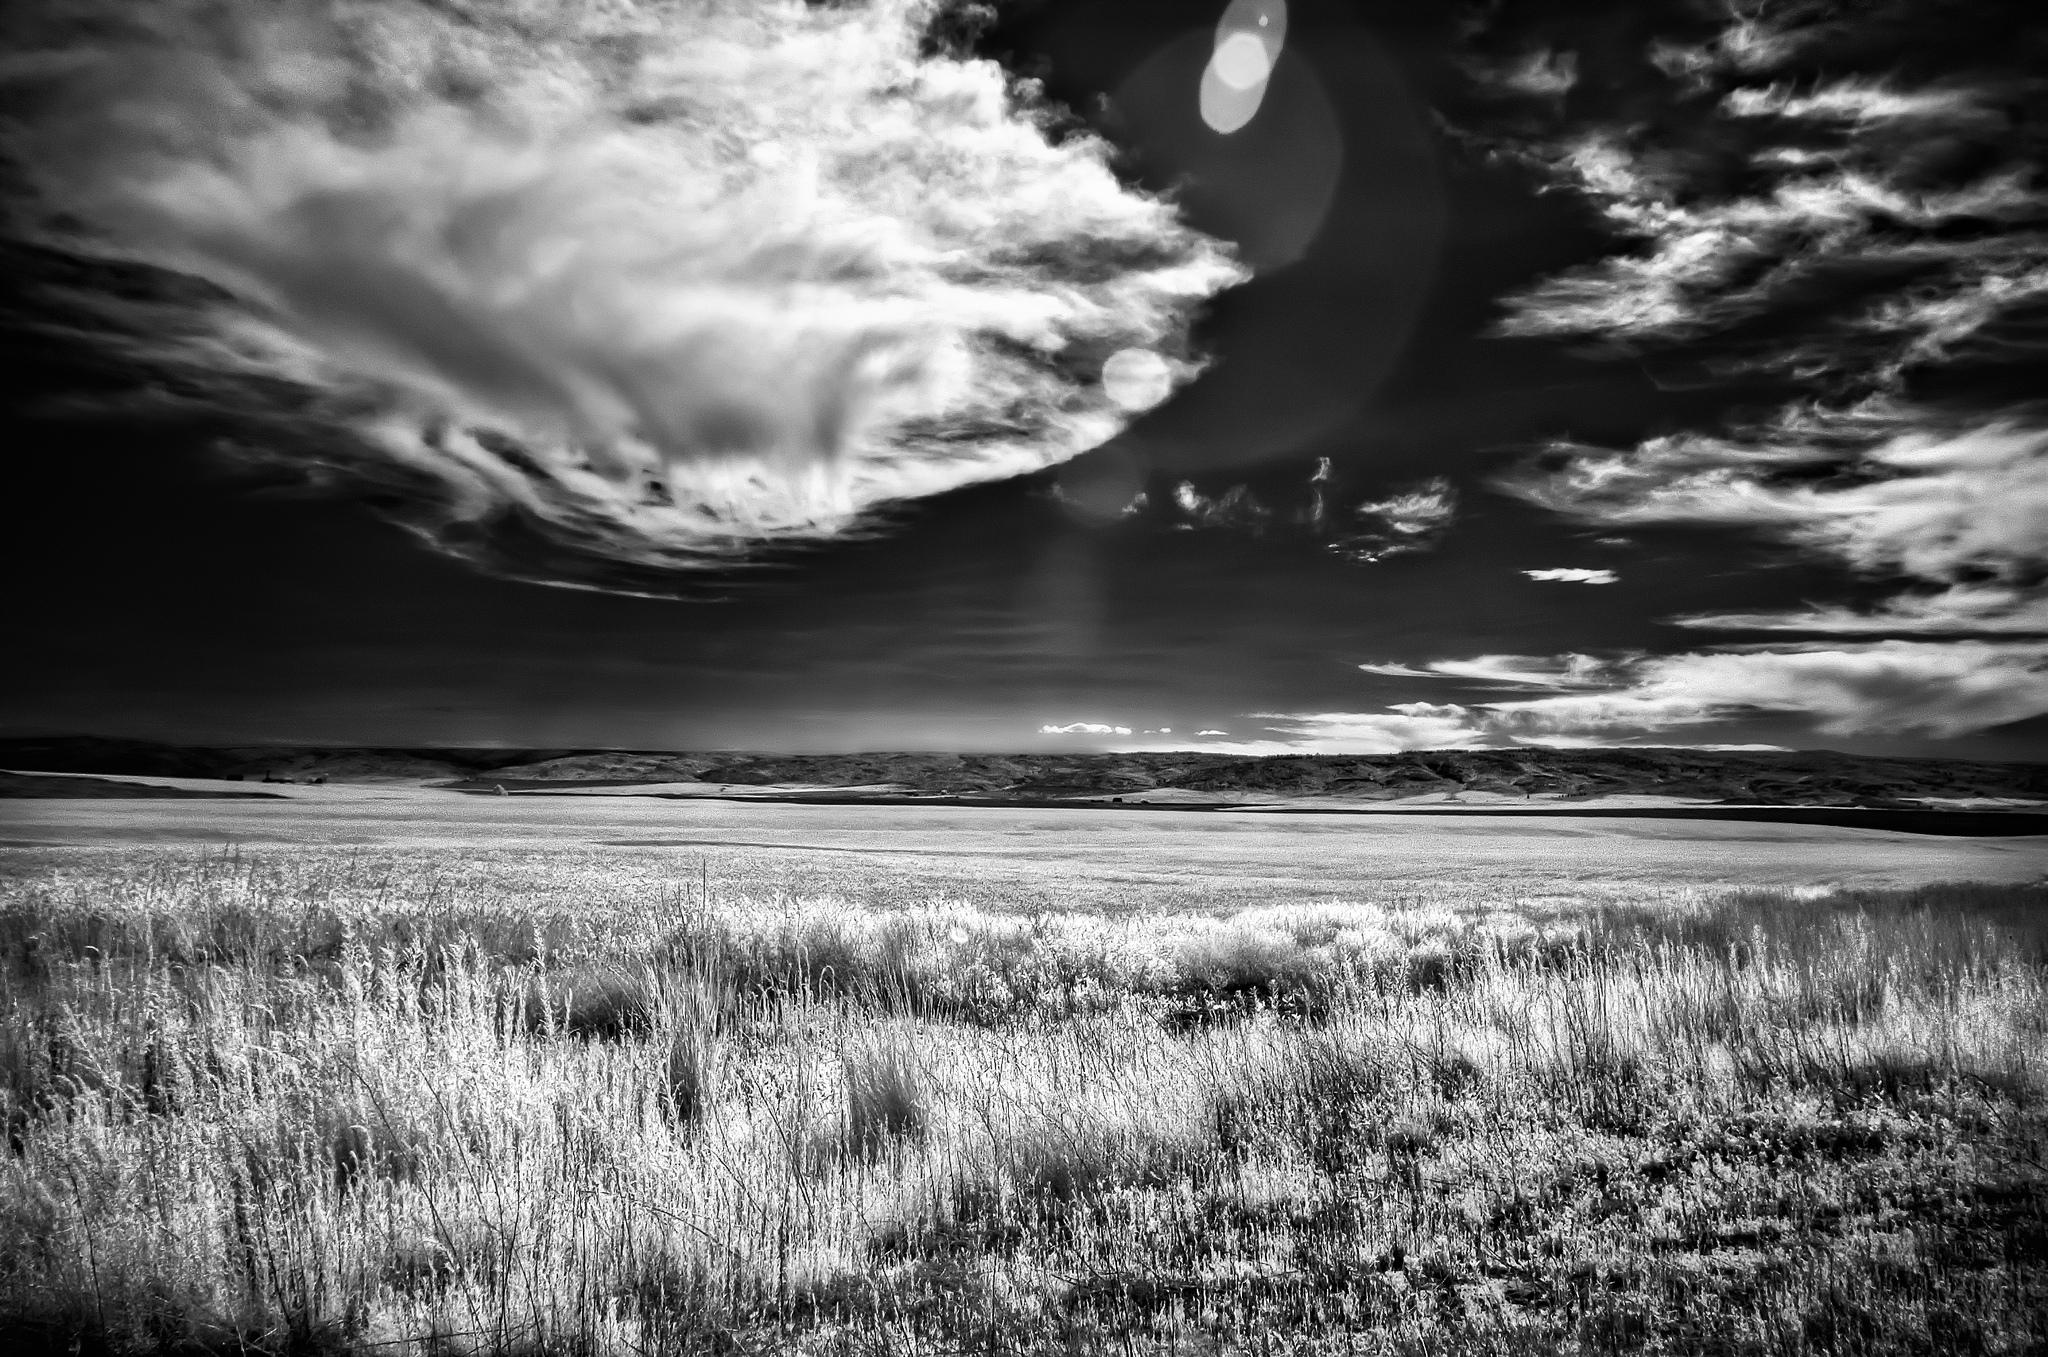 Wallpaper Sunlight Landscape Mountains Dark Nature Reflection Grass Sky Outdoors Field Calm Hills Cold Filter Horizon Windy Tornado Highway Infrared Glare Tripod Light Blackandwhite Country Dramatic Cloud Tree Nikkor 50mm